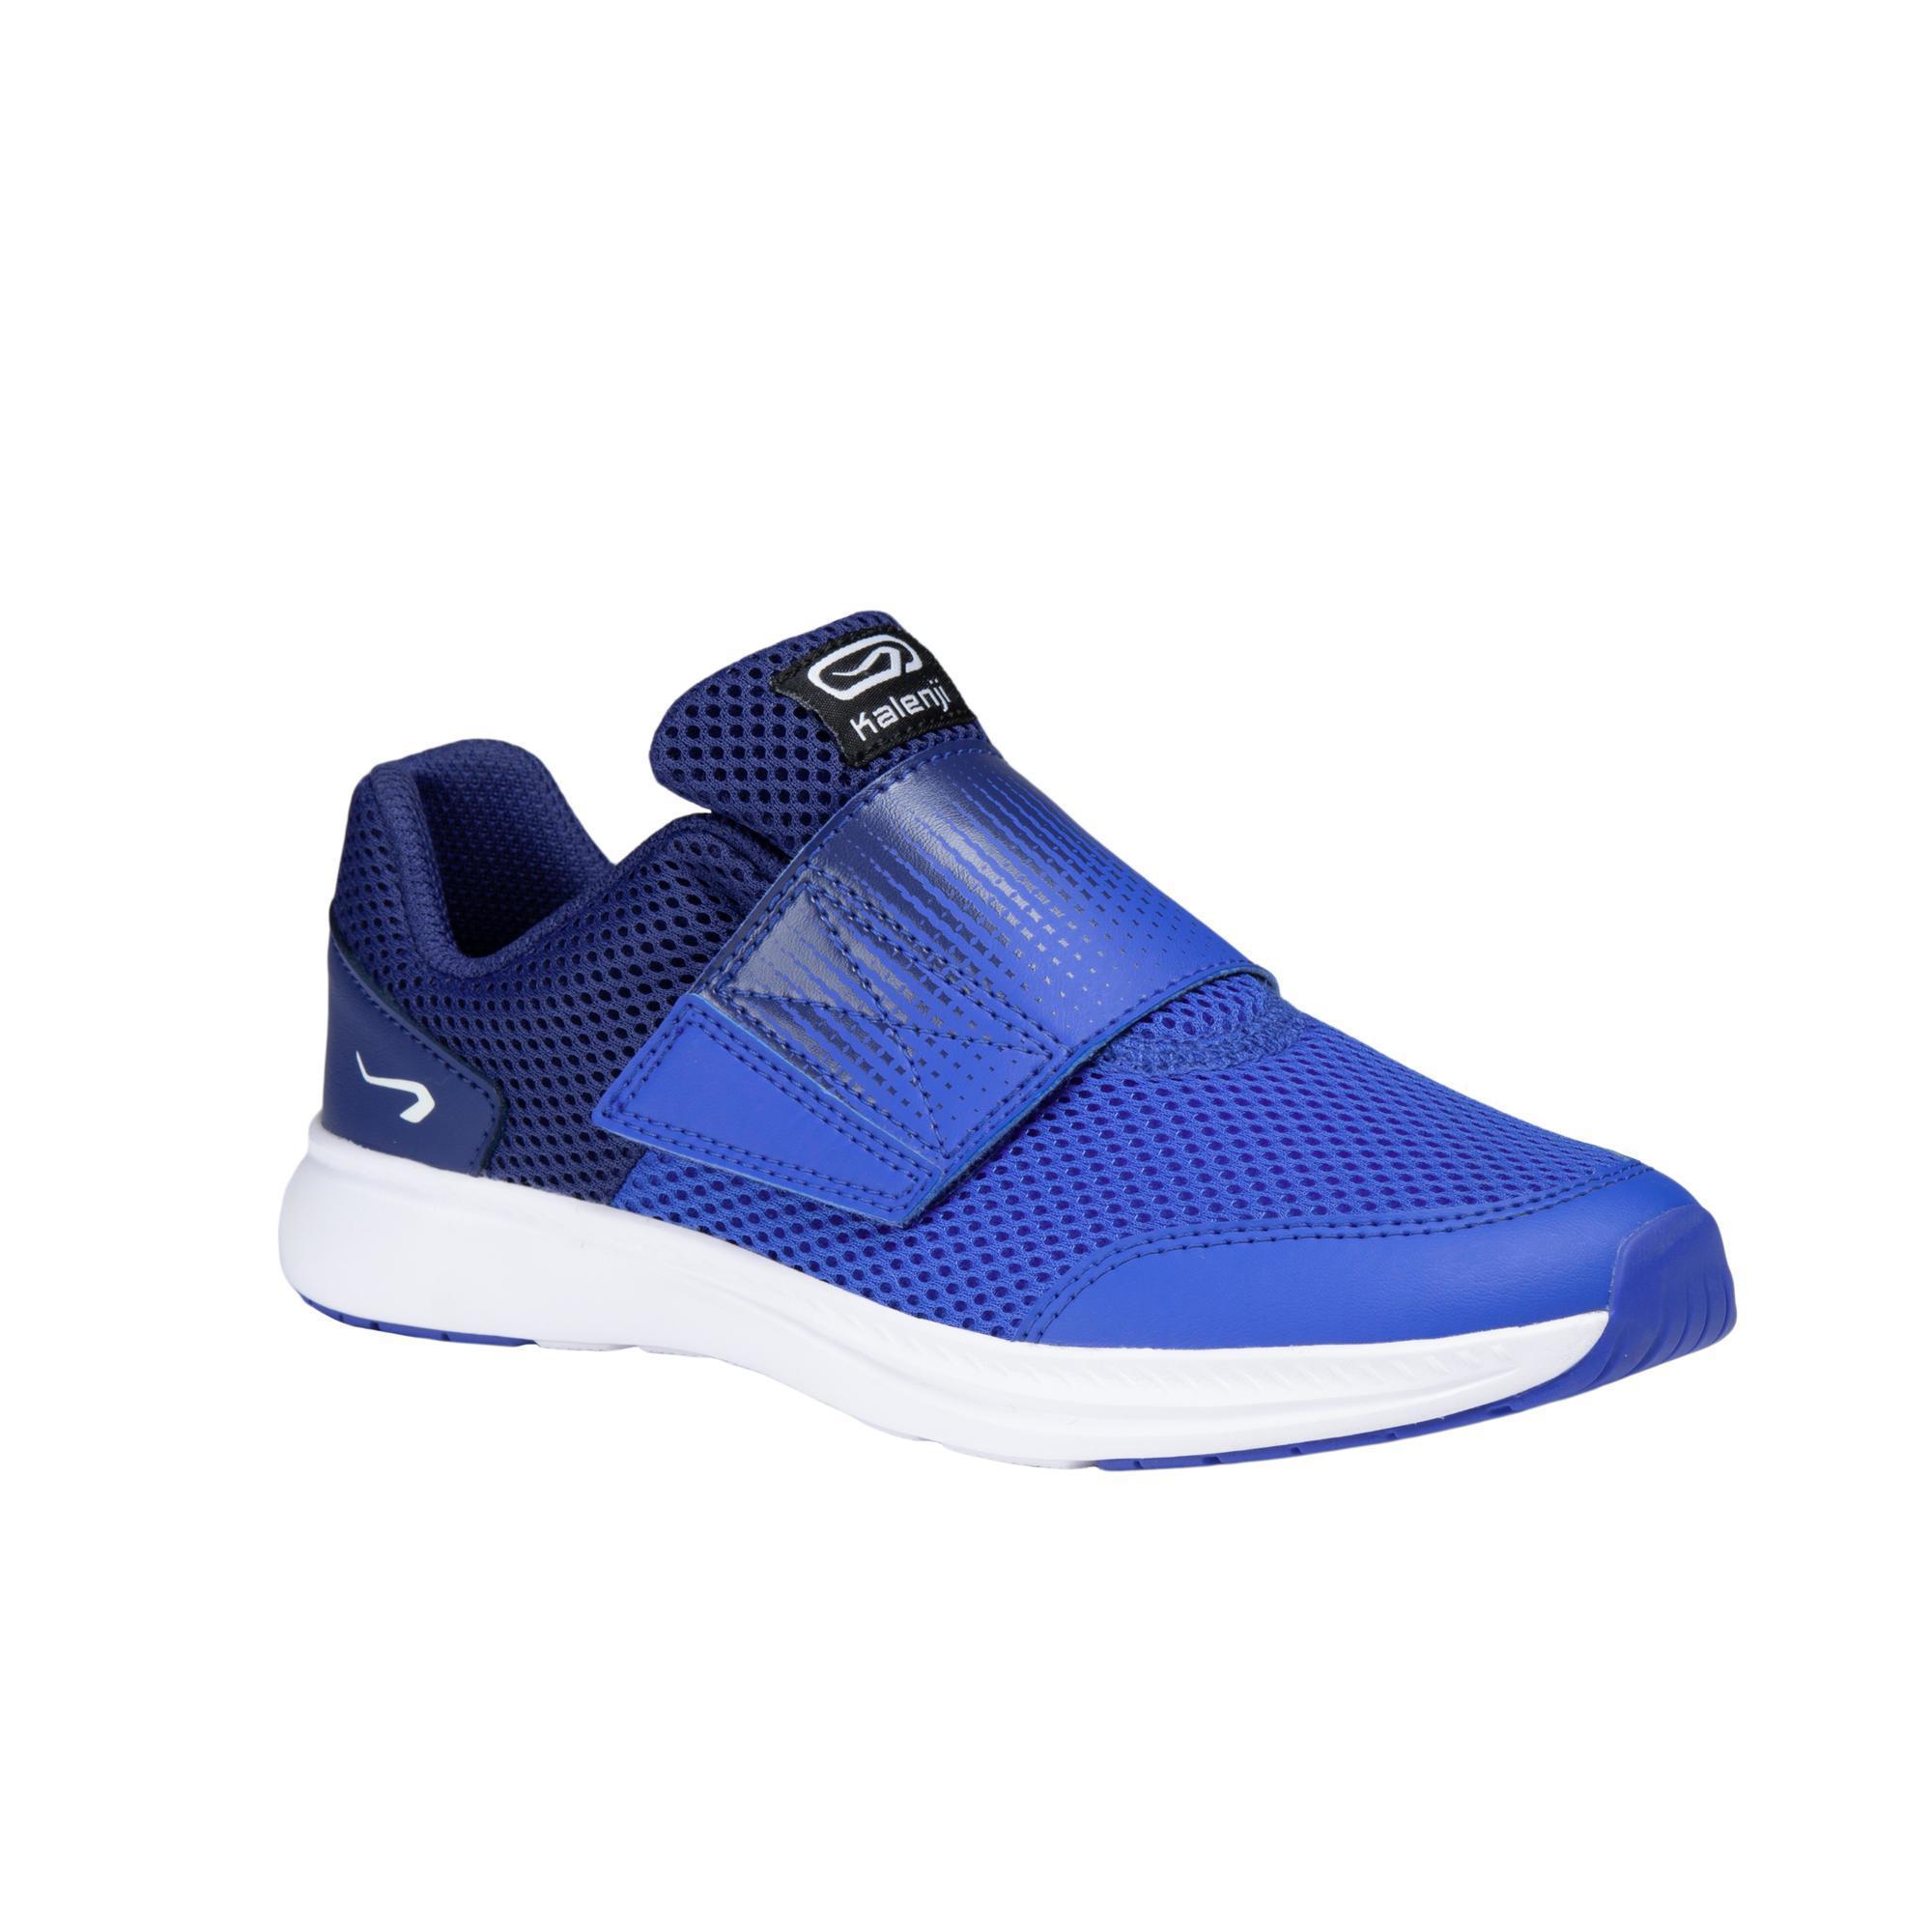 Chaussures athlétisme enfant AT Easy bleue - Kalenji